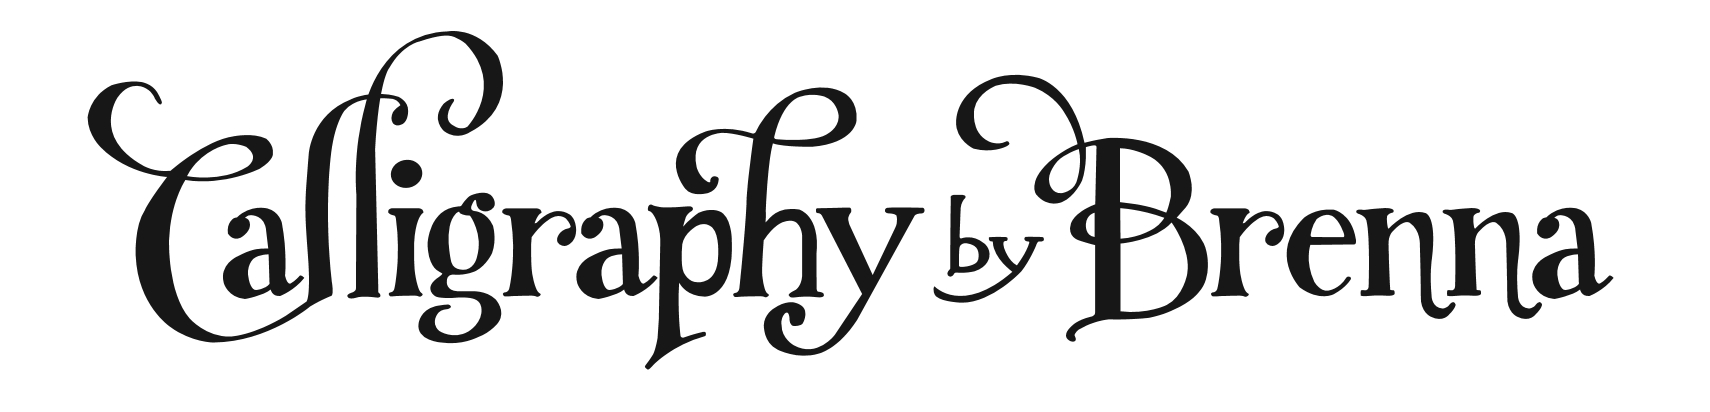 calligraphybybrenna-alone-header